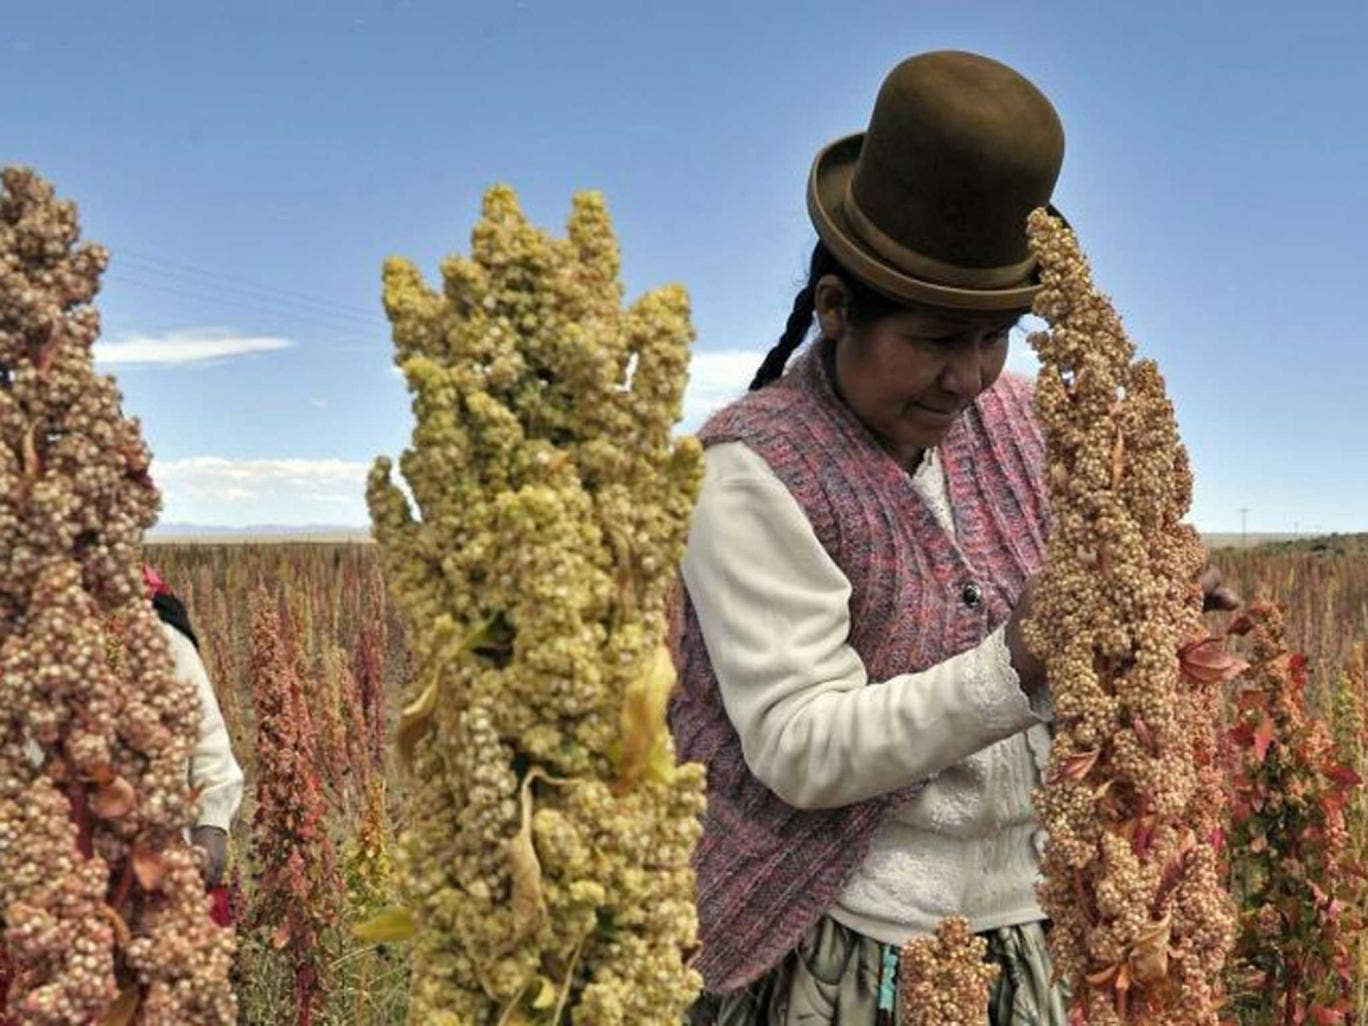 Against the grain: a Bolivian farmer checks his quinoa, now a key ingredient in high-end salads